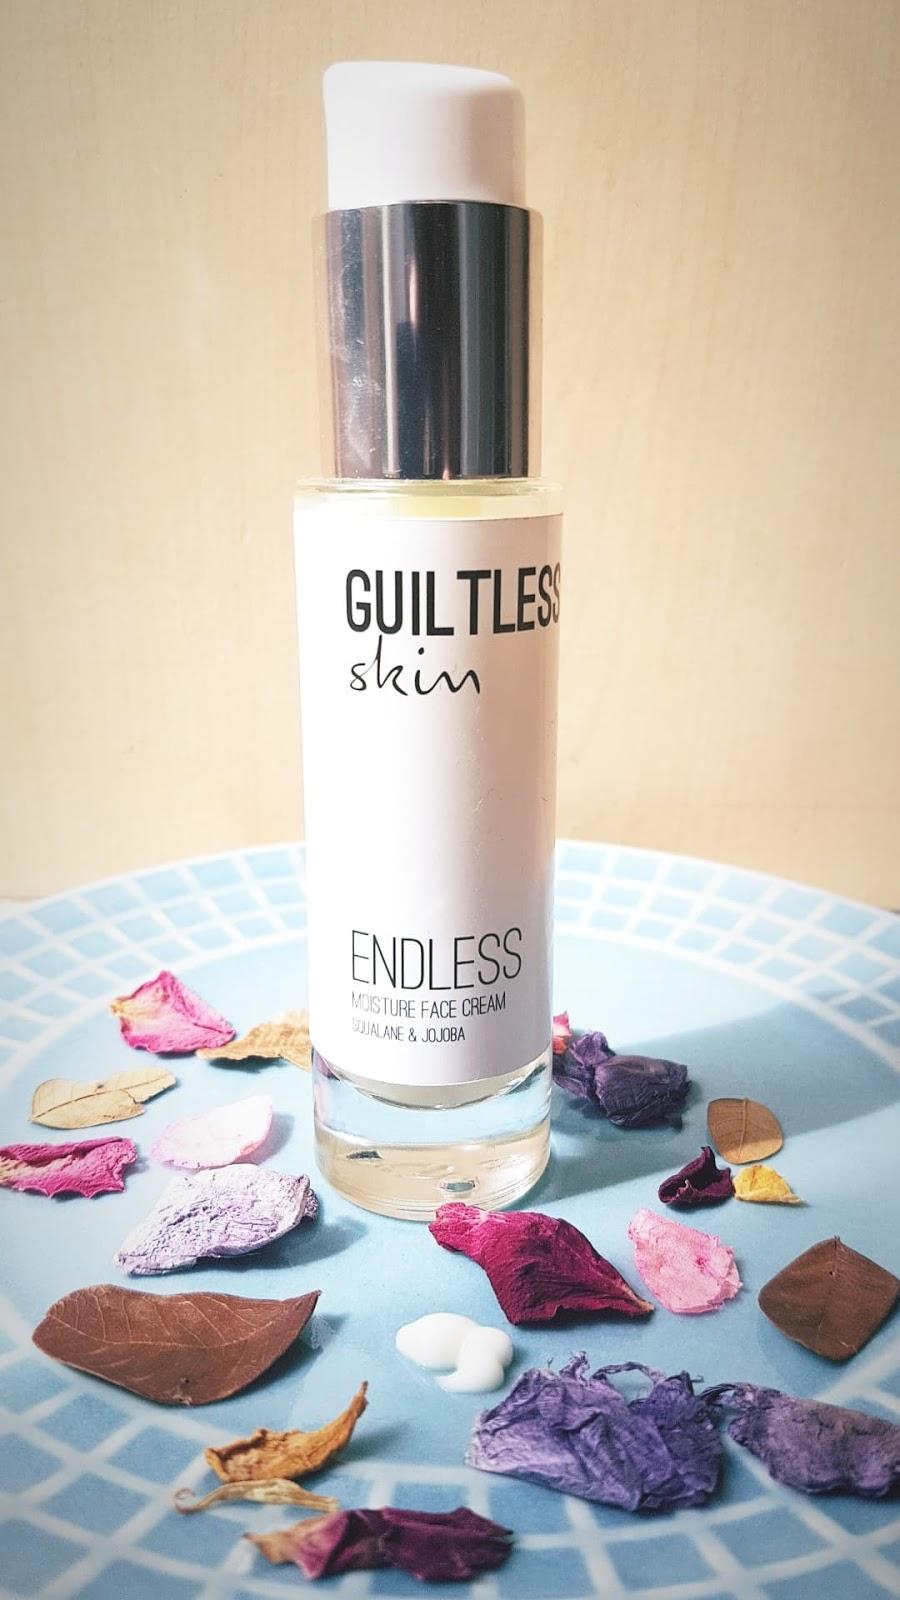 Guiltless Skin Endless Moisture Face Cream Review